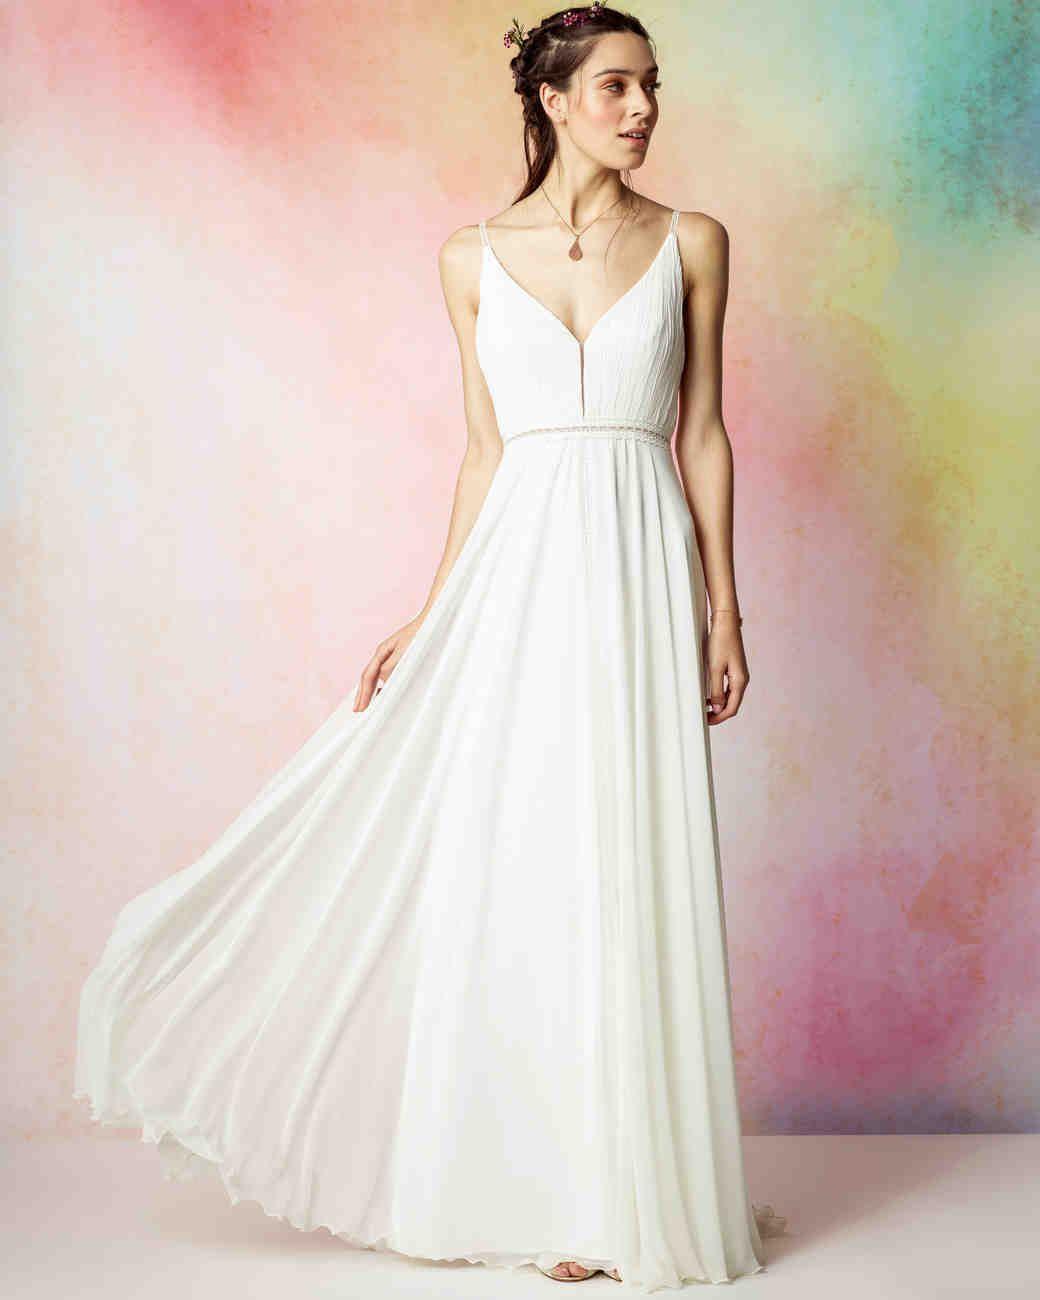 Rembo Styling Fall 2017 Wedding Dress Collection | Martha Stewart Weddings – Sleeveless A-line wedding dress